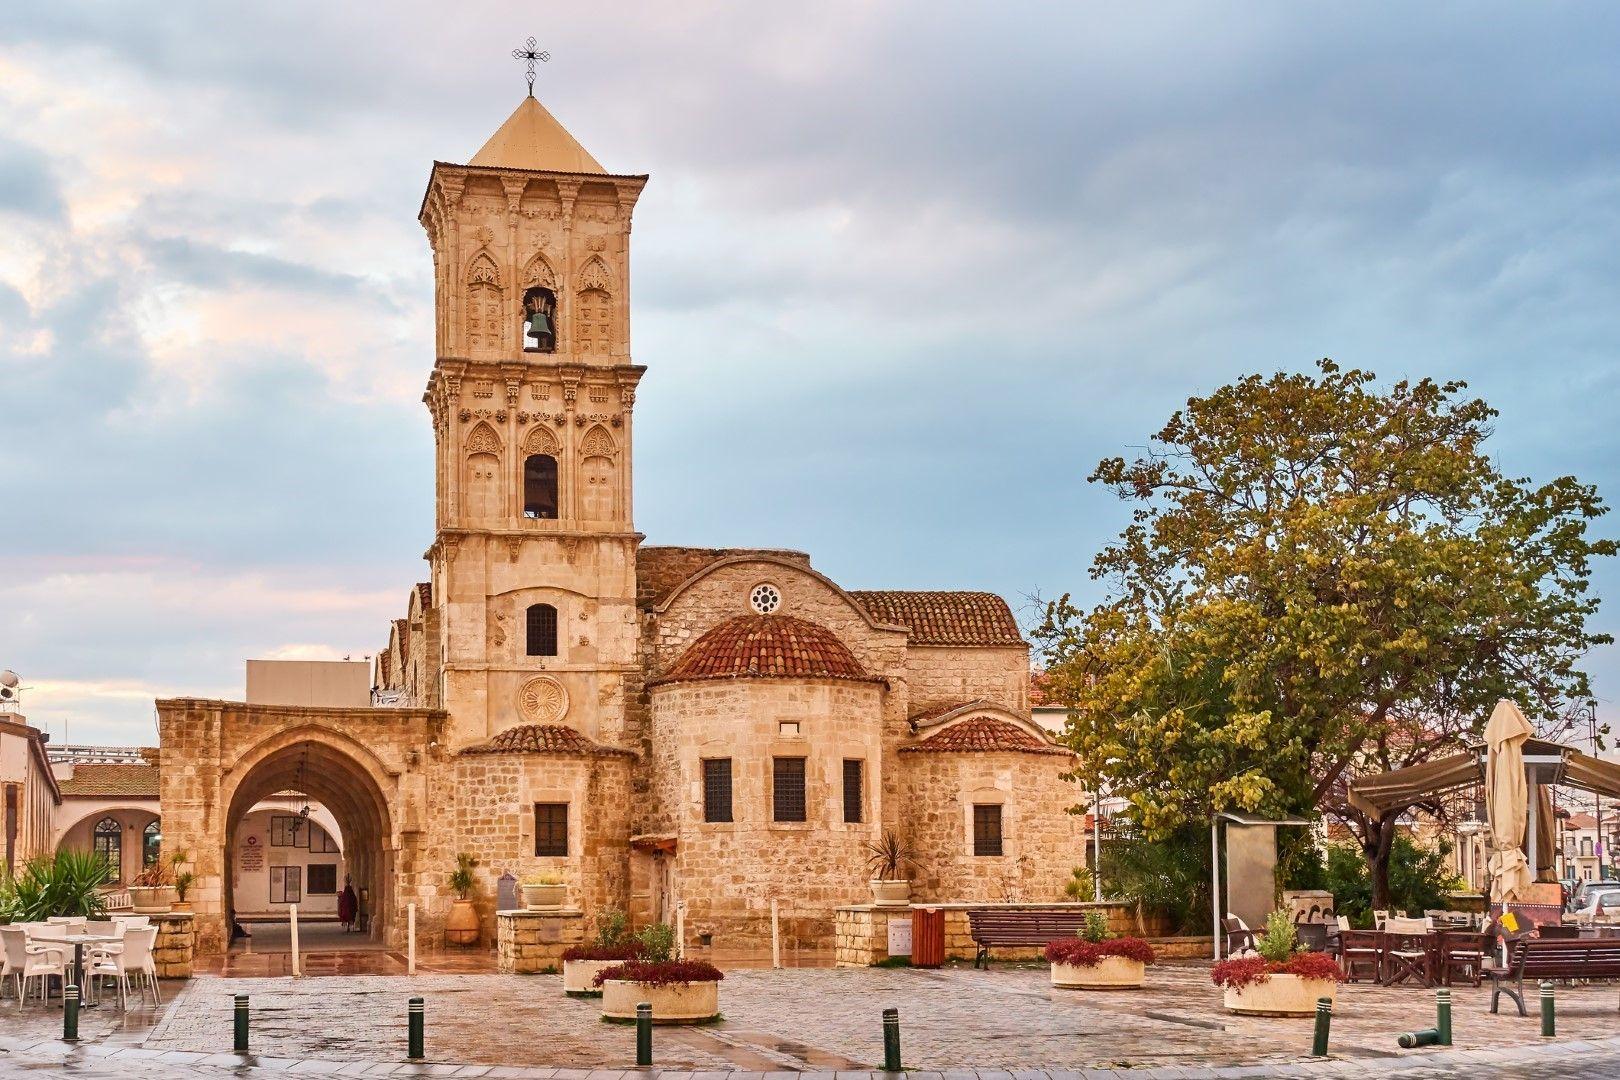 Църквата Агиоз Лазарос